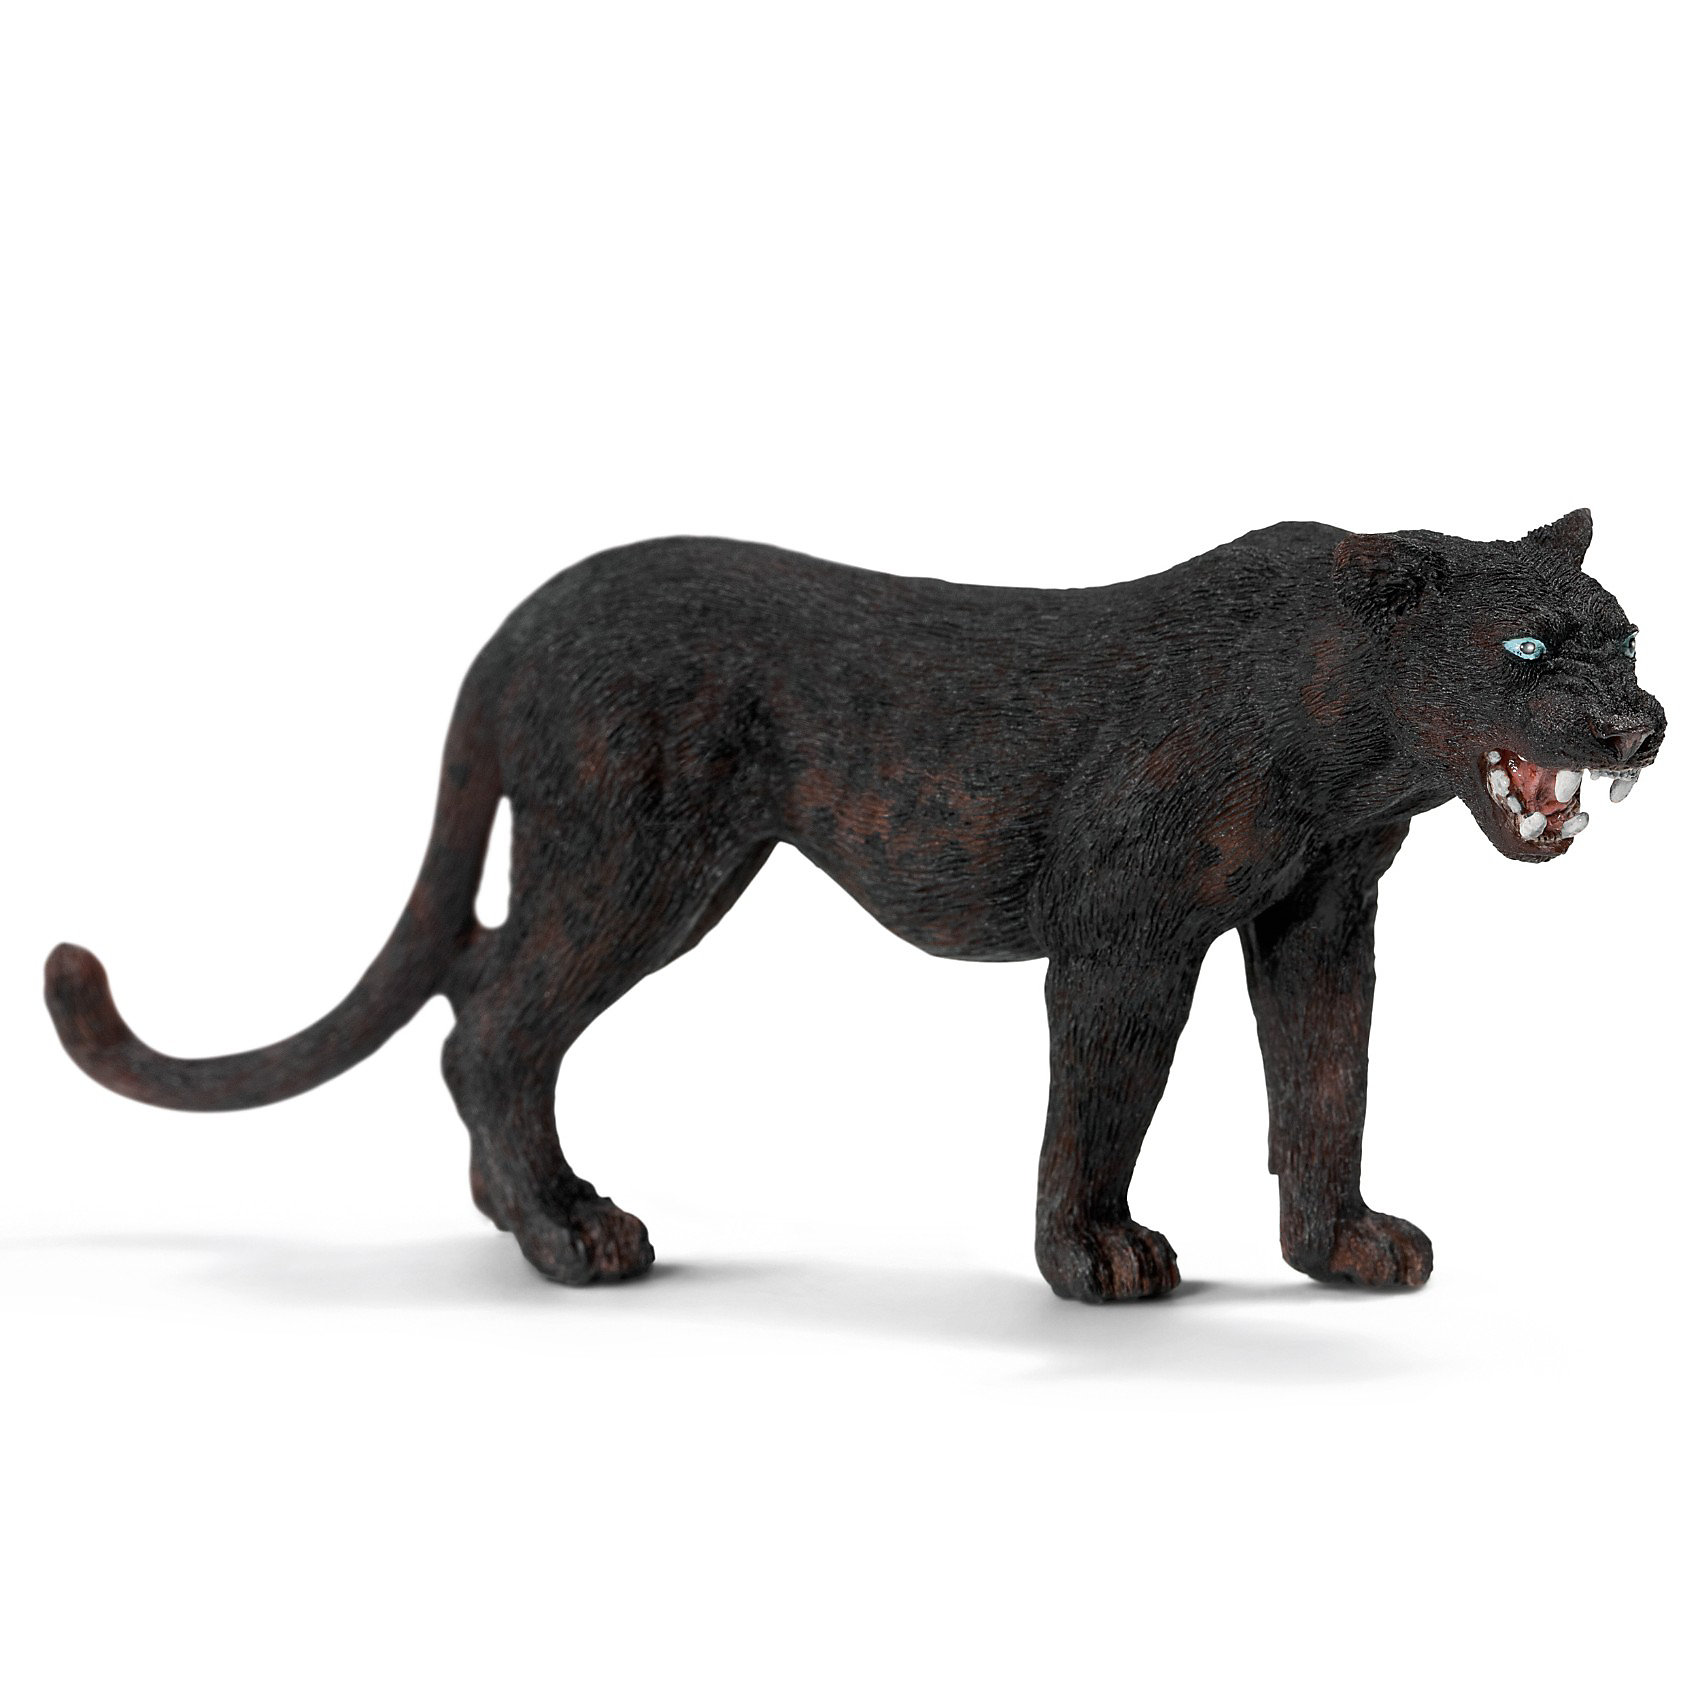 Schleich Schleich Черная пантера. Серия Дикие животные животные серия антистресс альбом